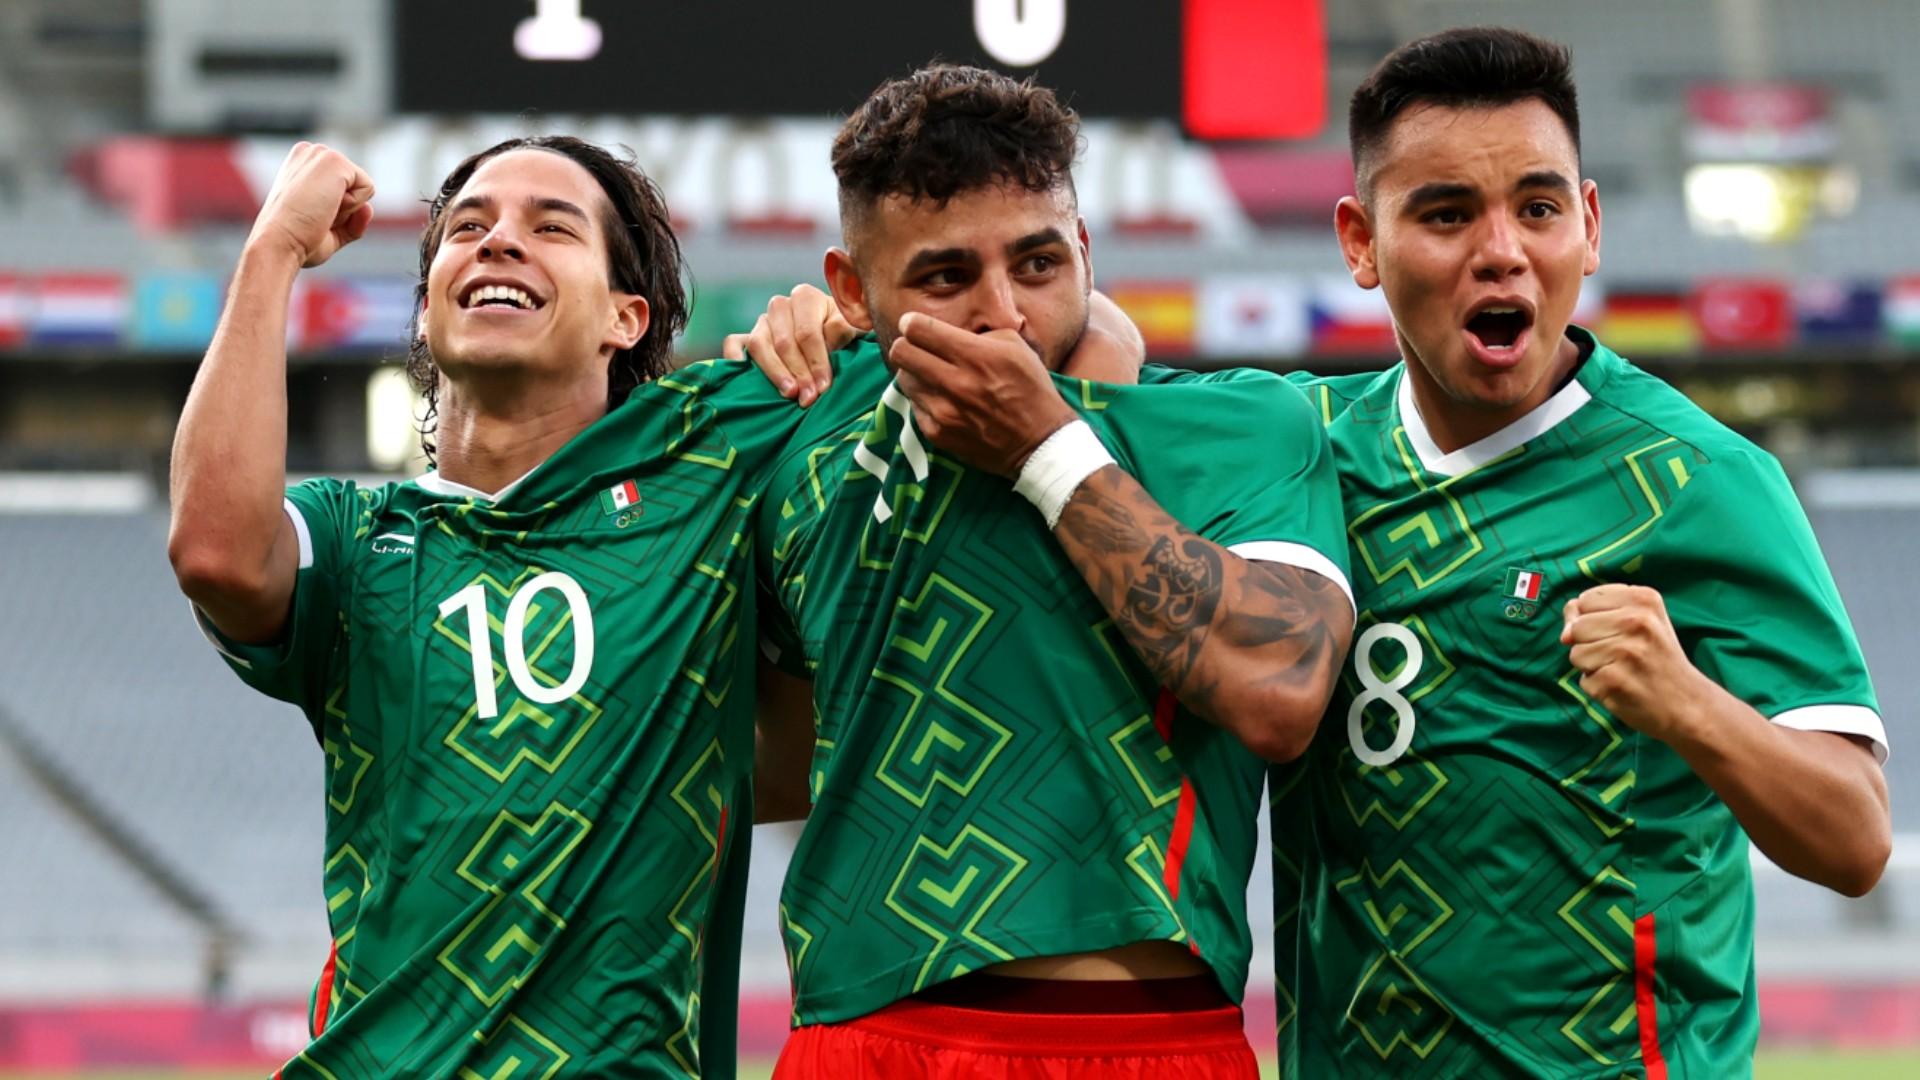 Mexico-celebration-2021-tokyo-olympics_1ejfgvb6o0icz1nt96jxznqe0j